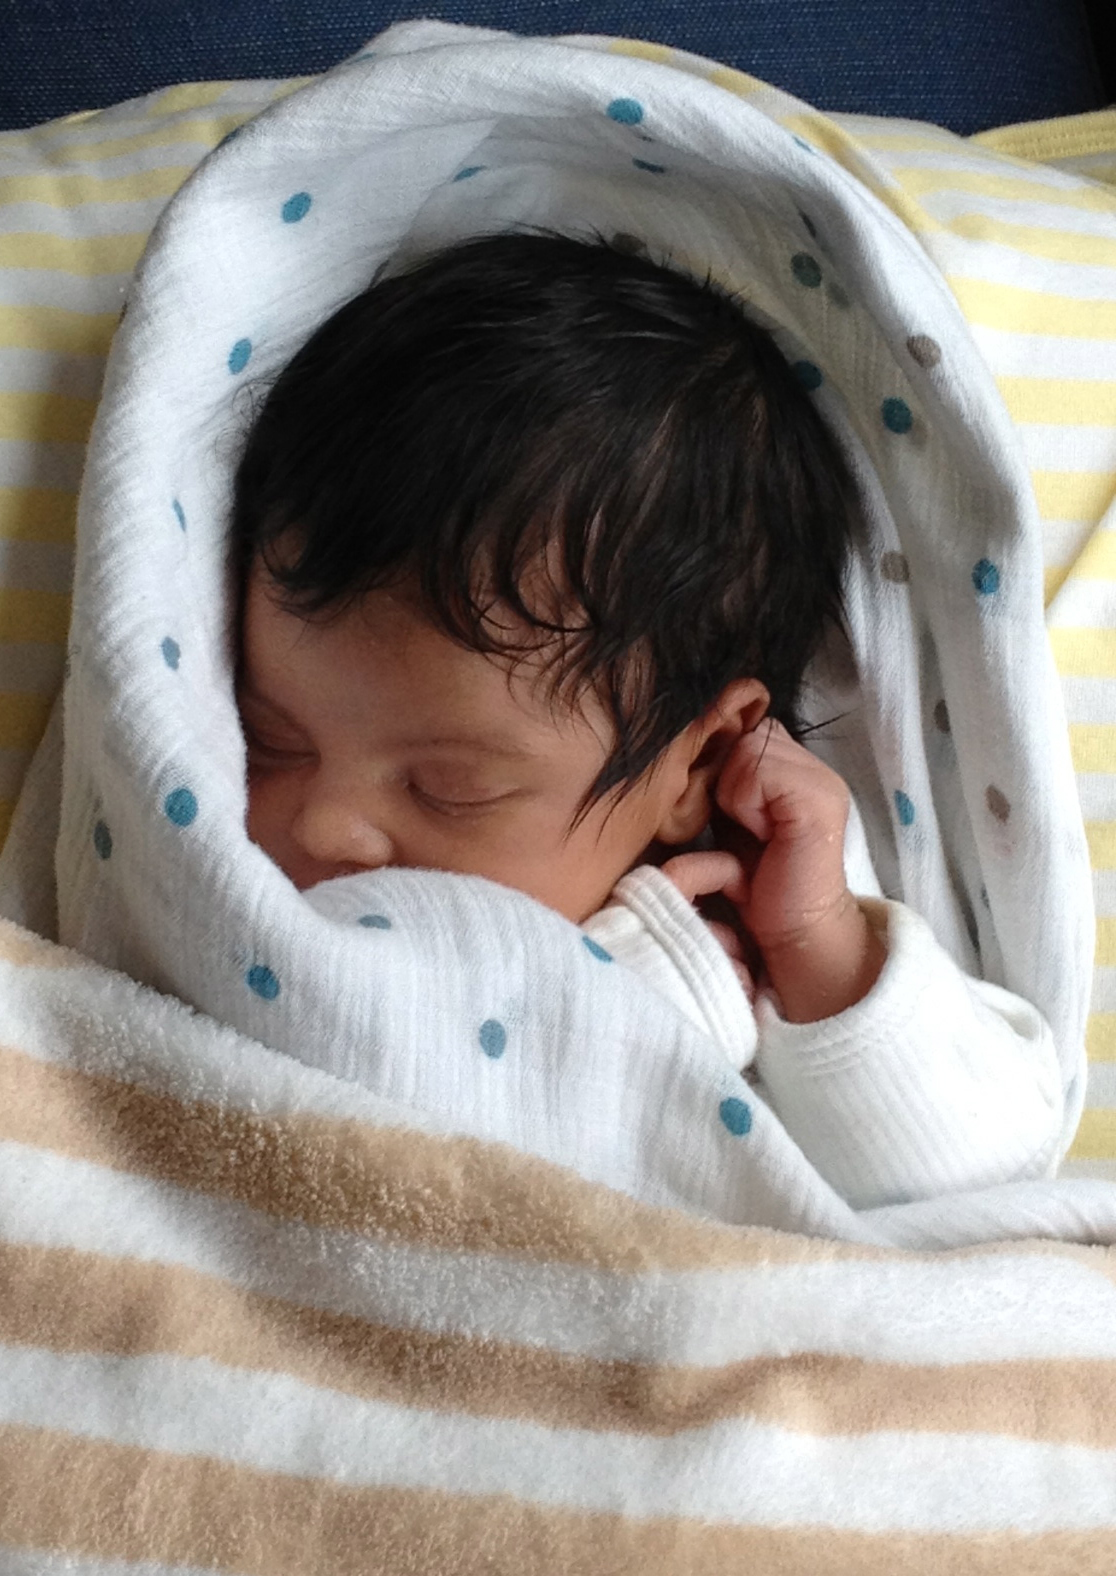 http://2.bp.blogspot.com/-Hm4XpW2CG9M/TzYLebaOvFI/AAAAAAAAAGY/NrRGIwzYPSY/s1600/babycarter1.jpg